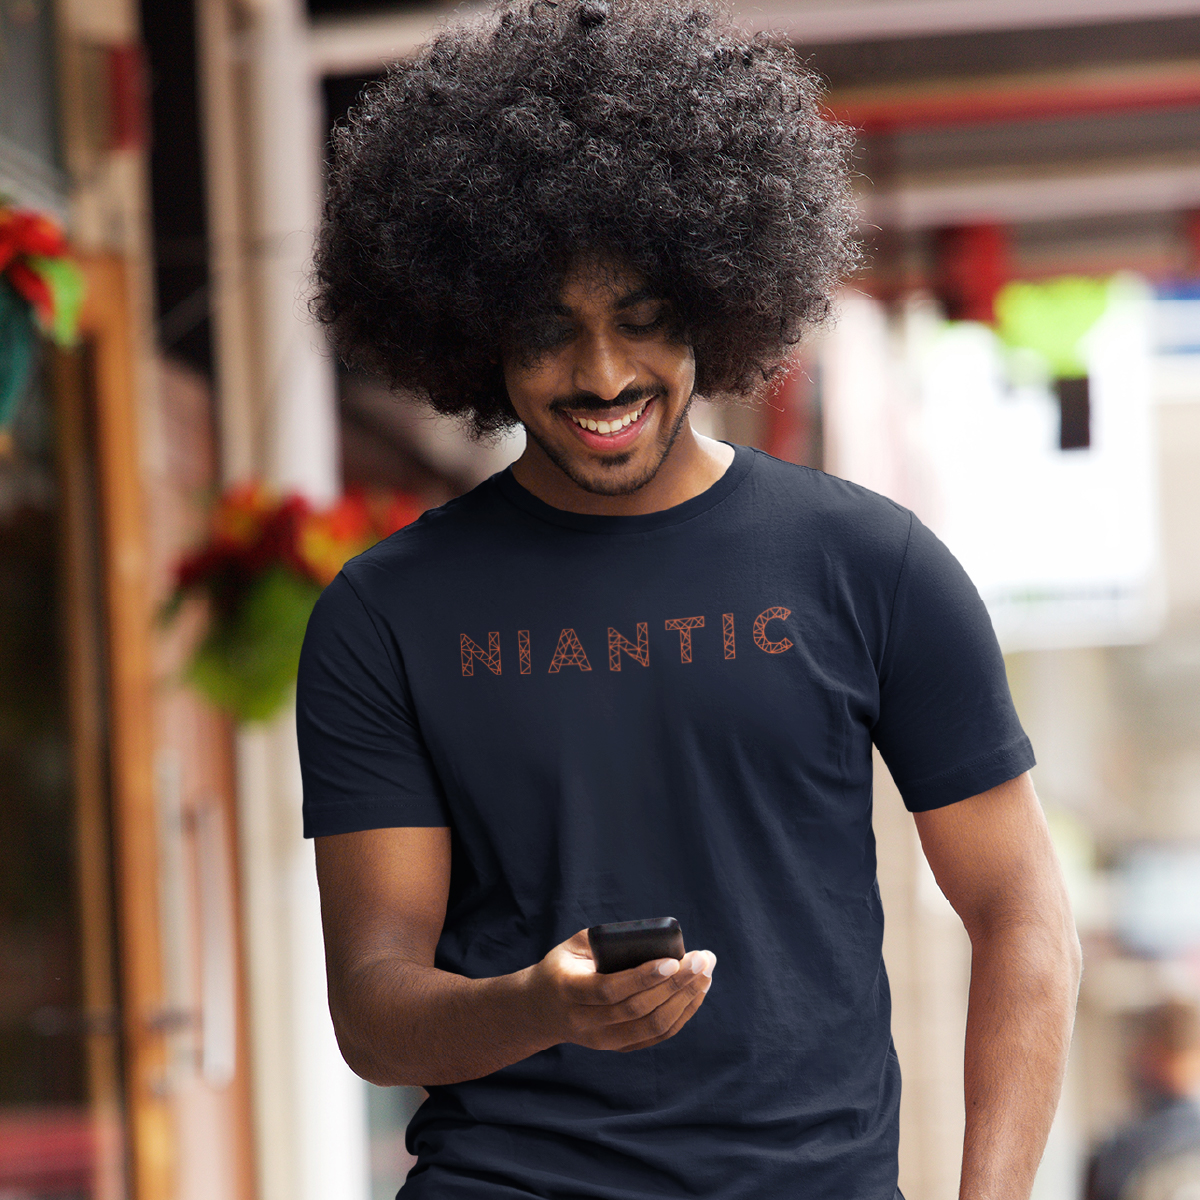 - Niantic Fractal T-Shirt